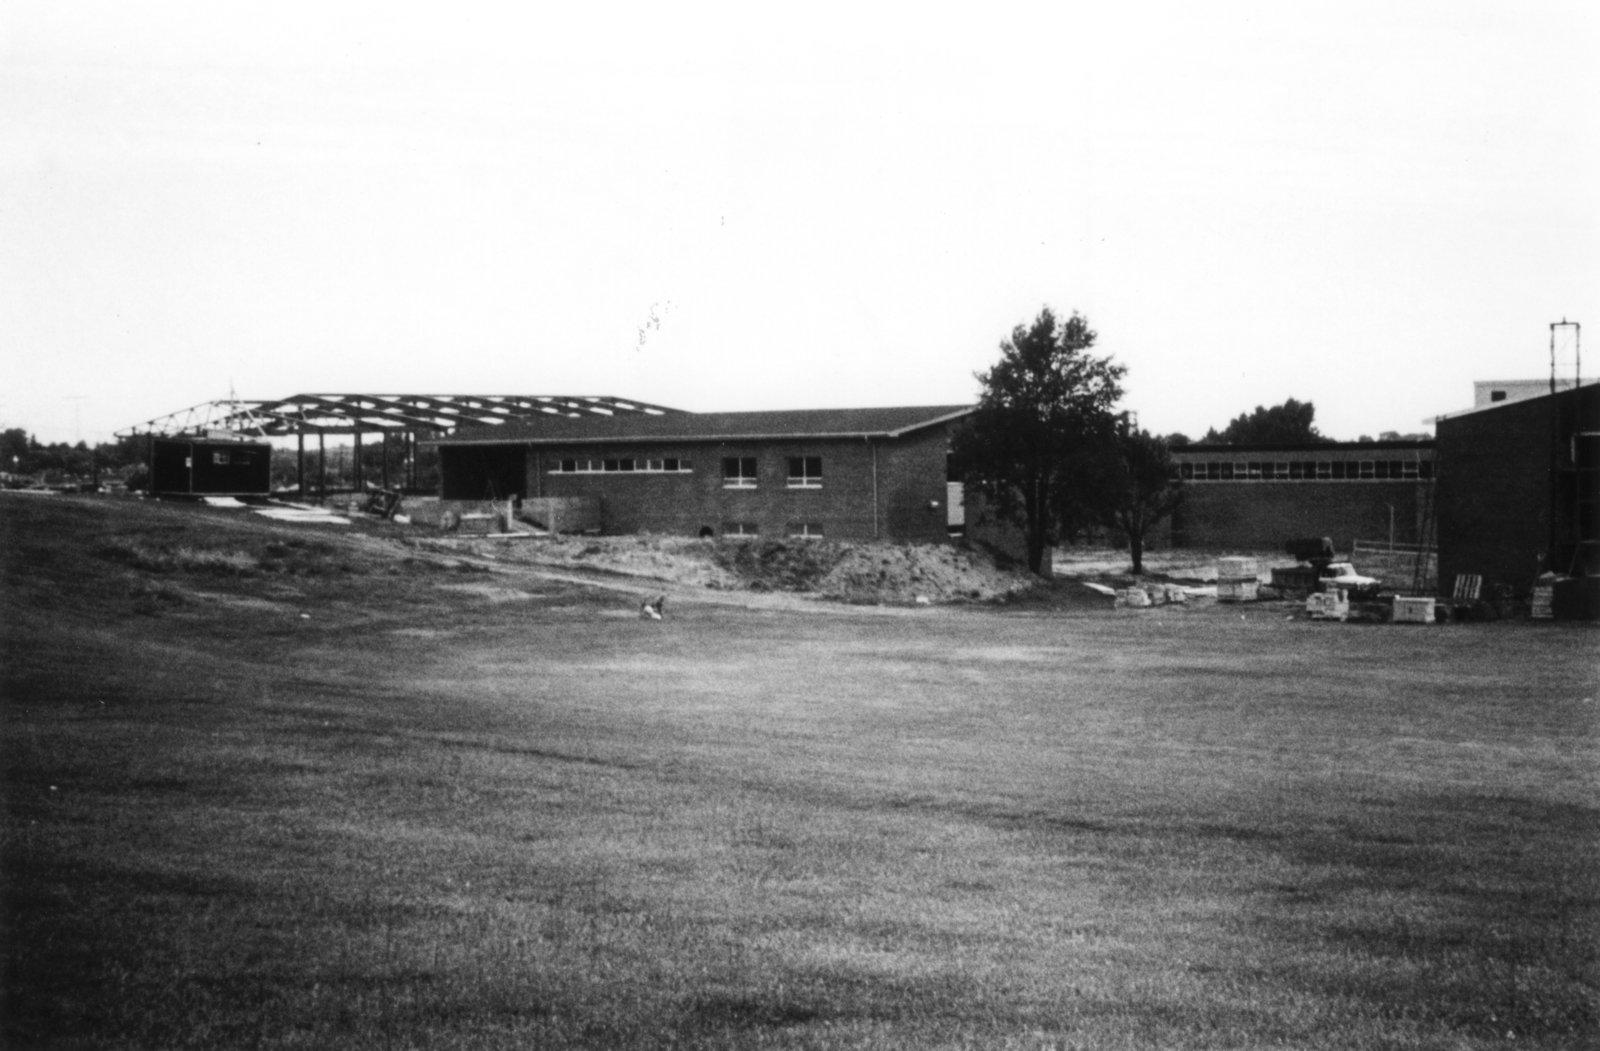 Original Student Union Building, Waterloo Lutheran University